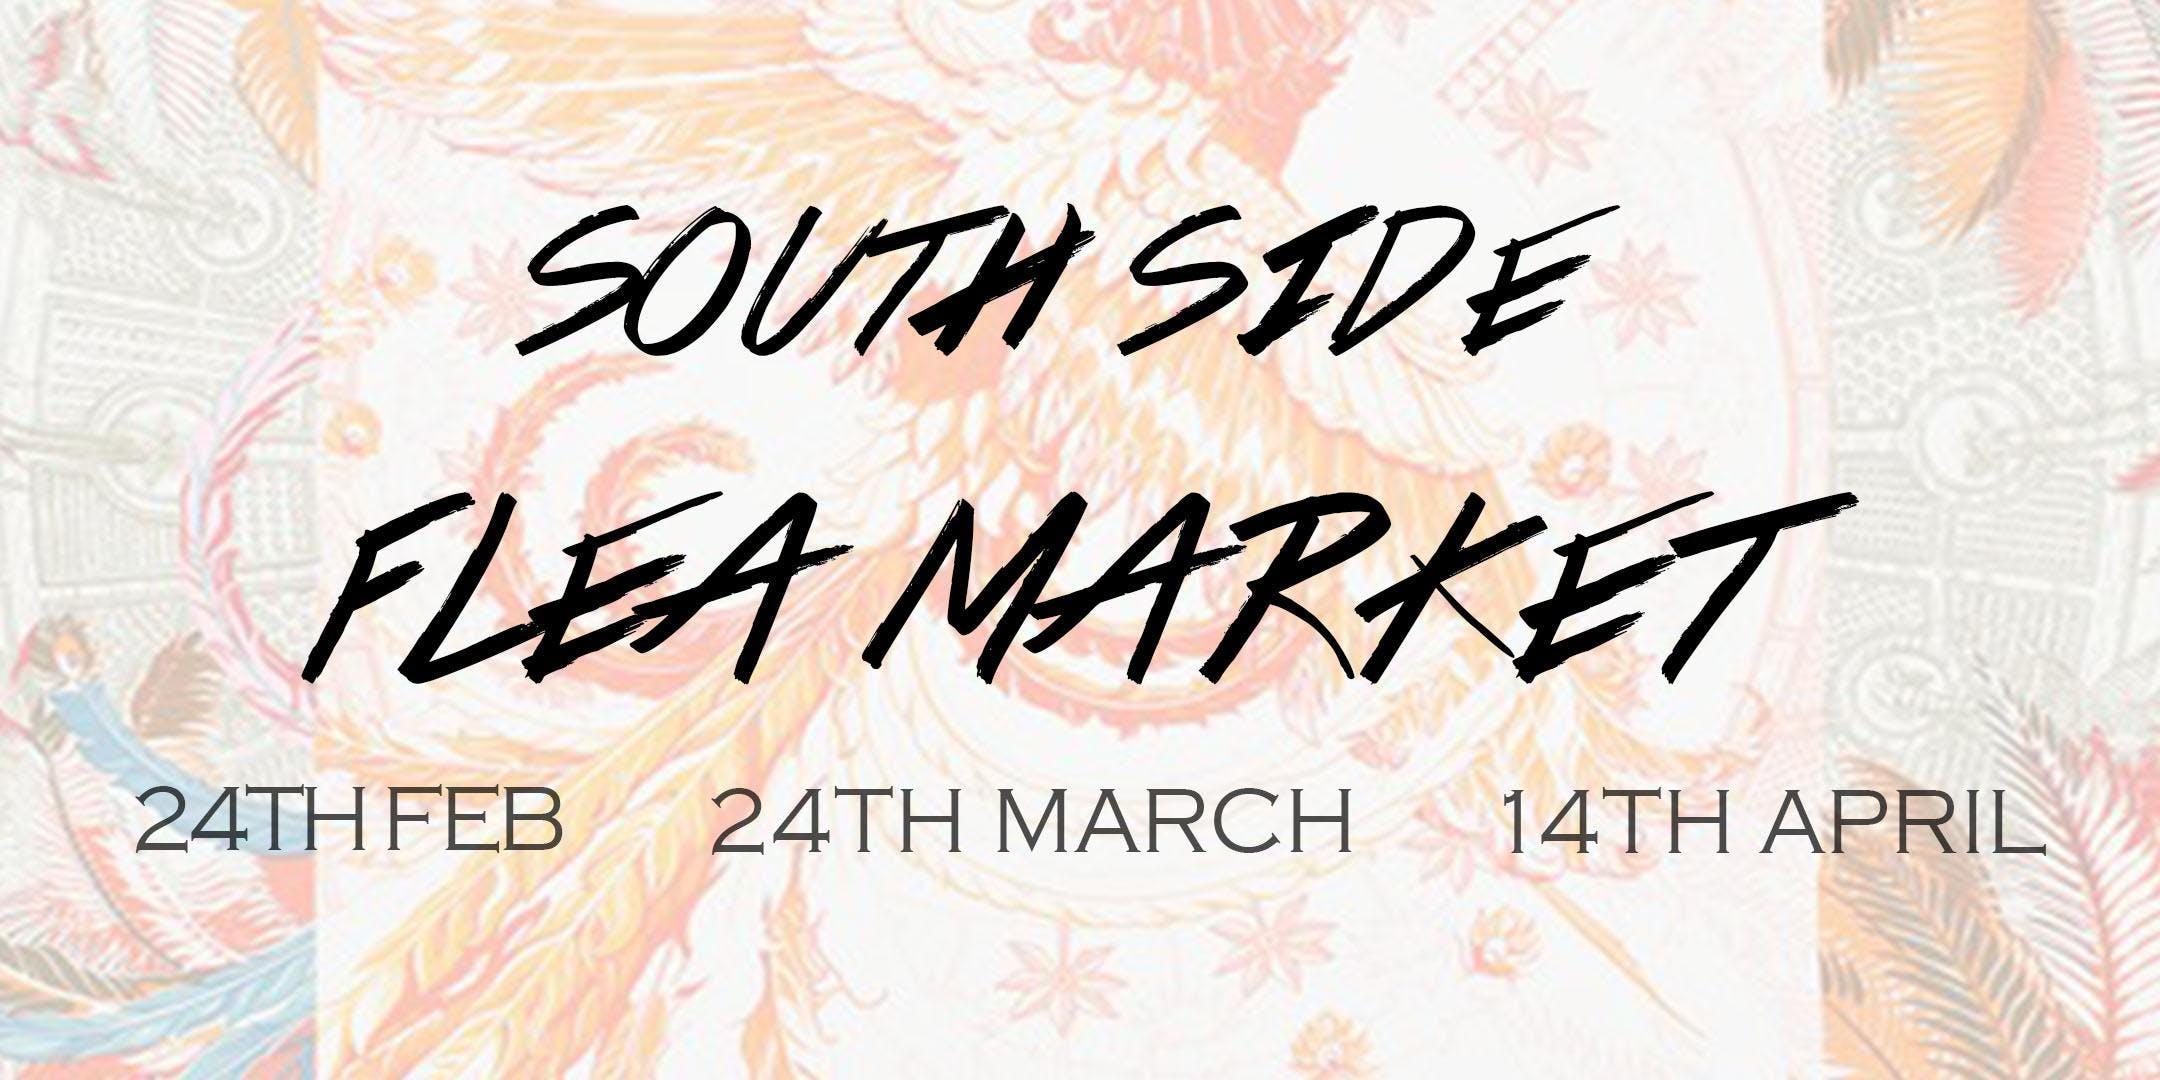 South Side Flea Market LOCATION SOUTH YARRA